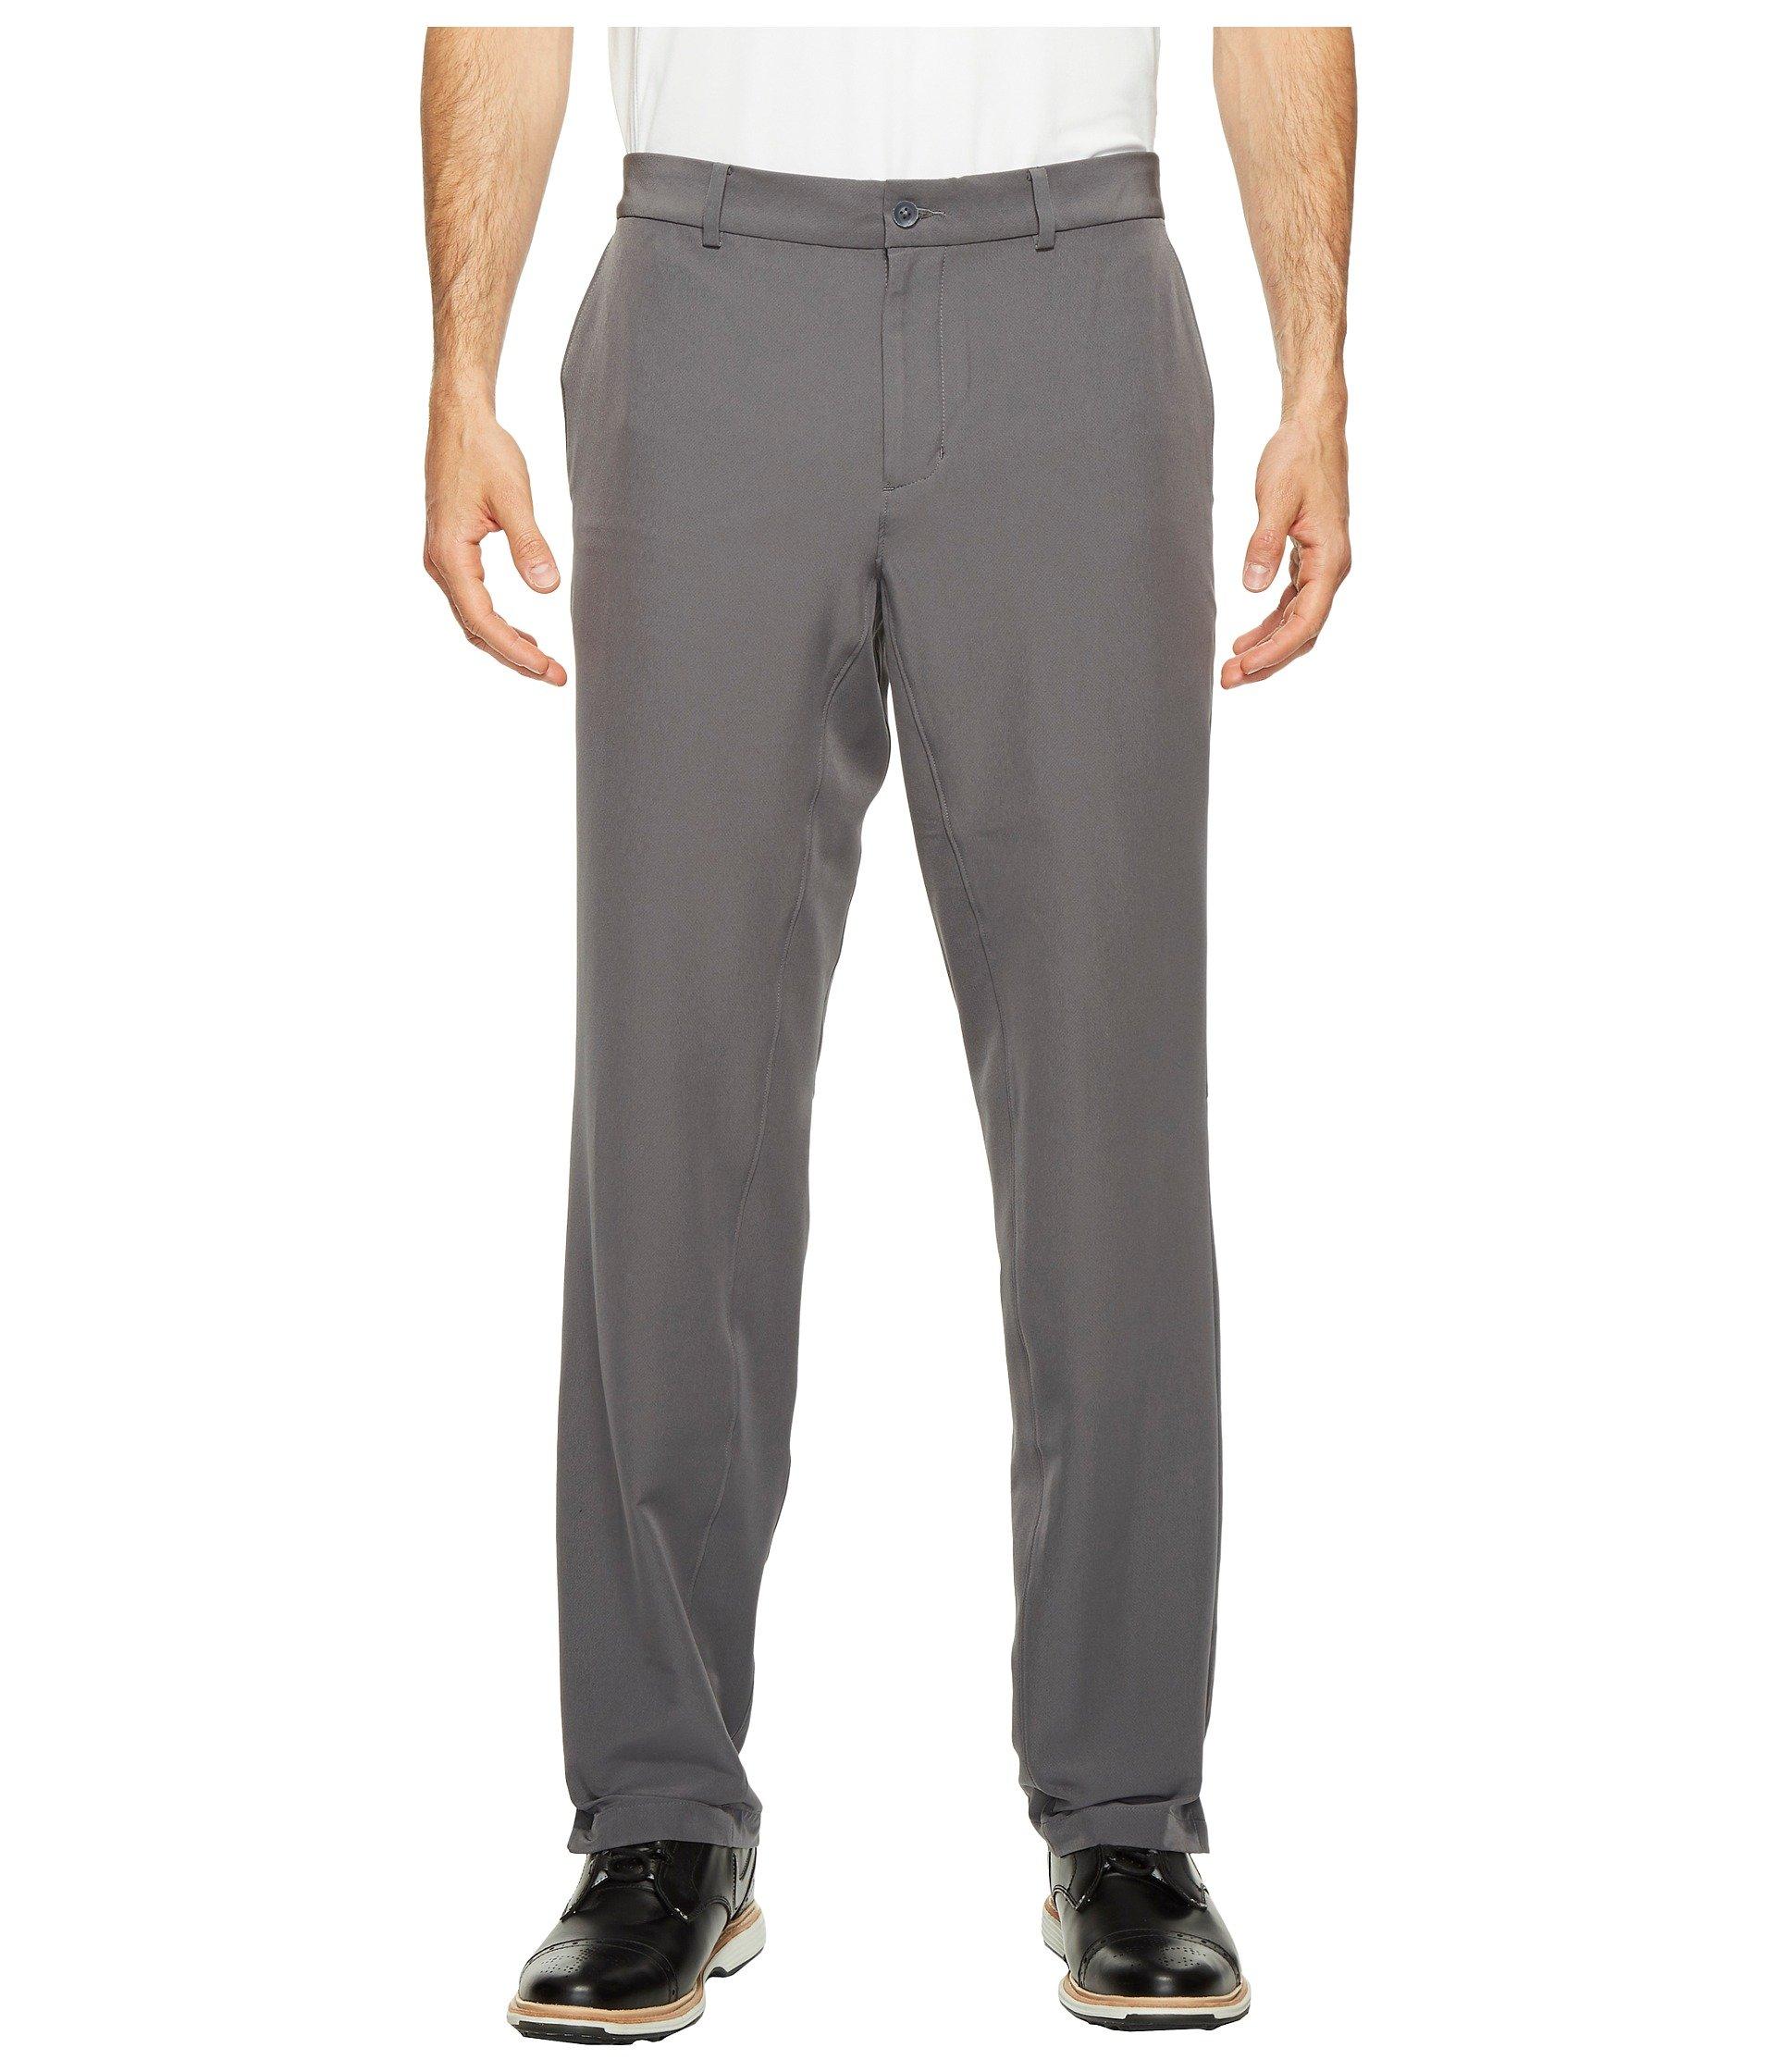 Nike Flex Men's Golf Pants (Dark Grey, 36W x 32L) by Nike